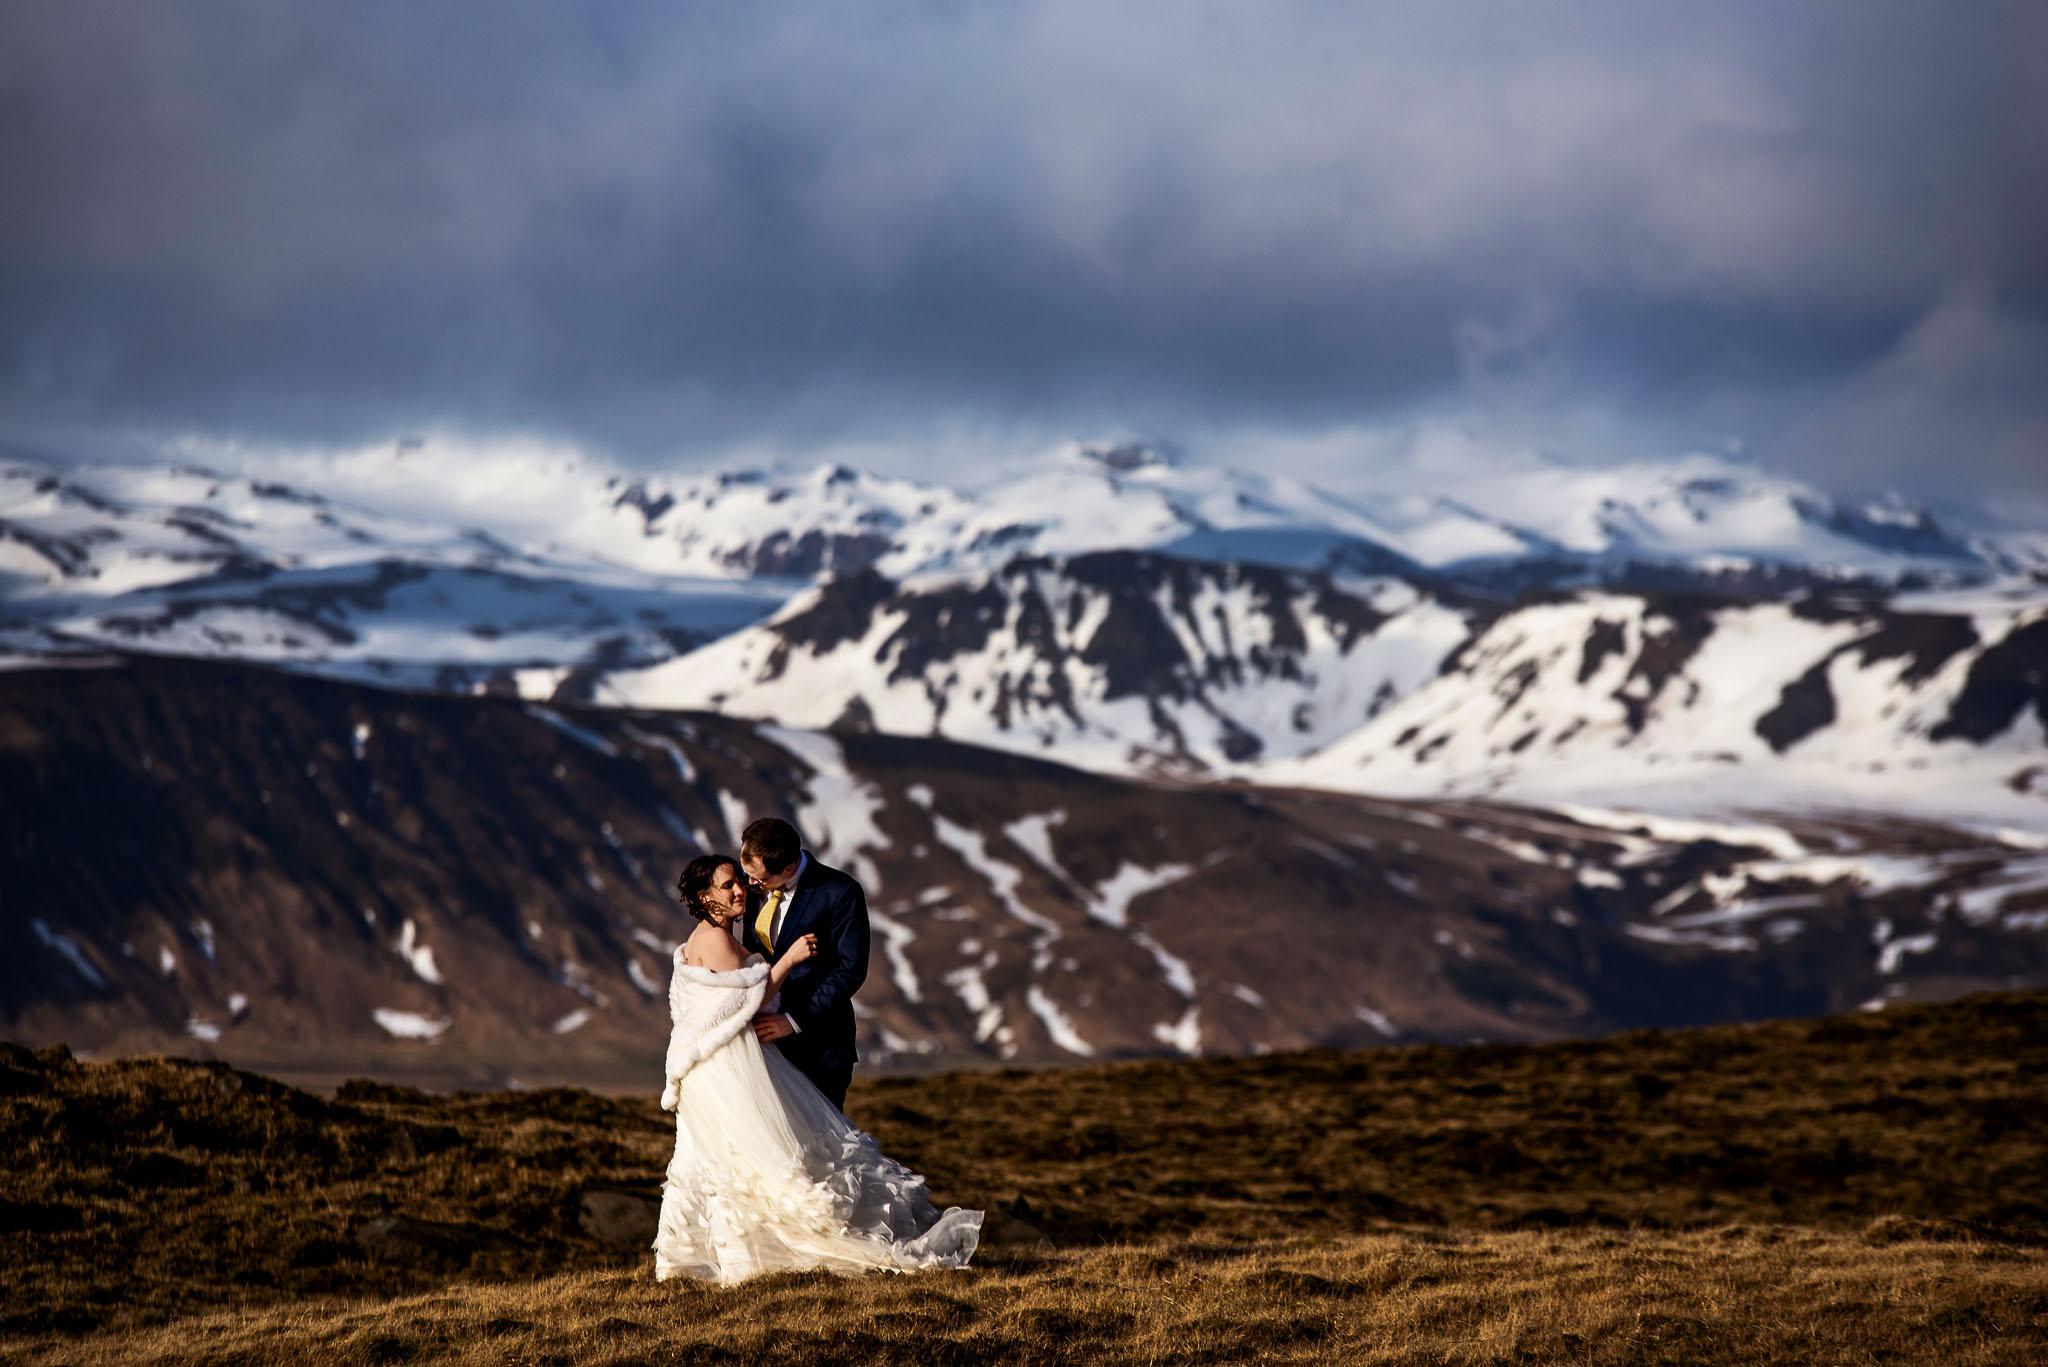 Kate + James | Iceland